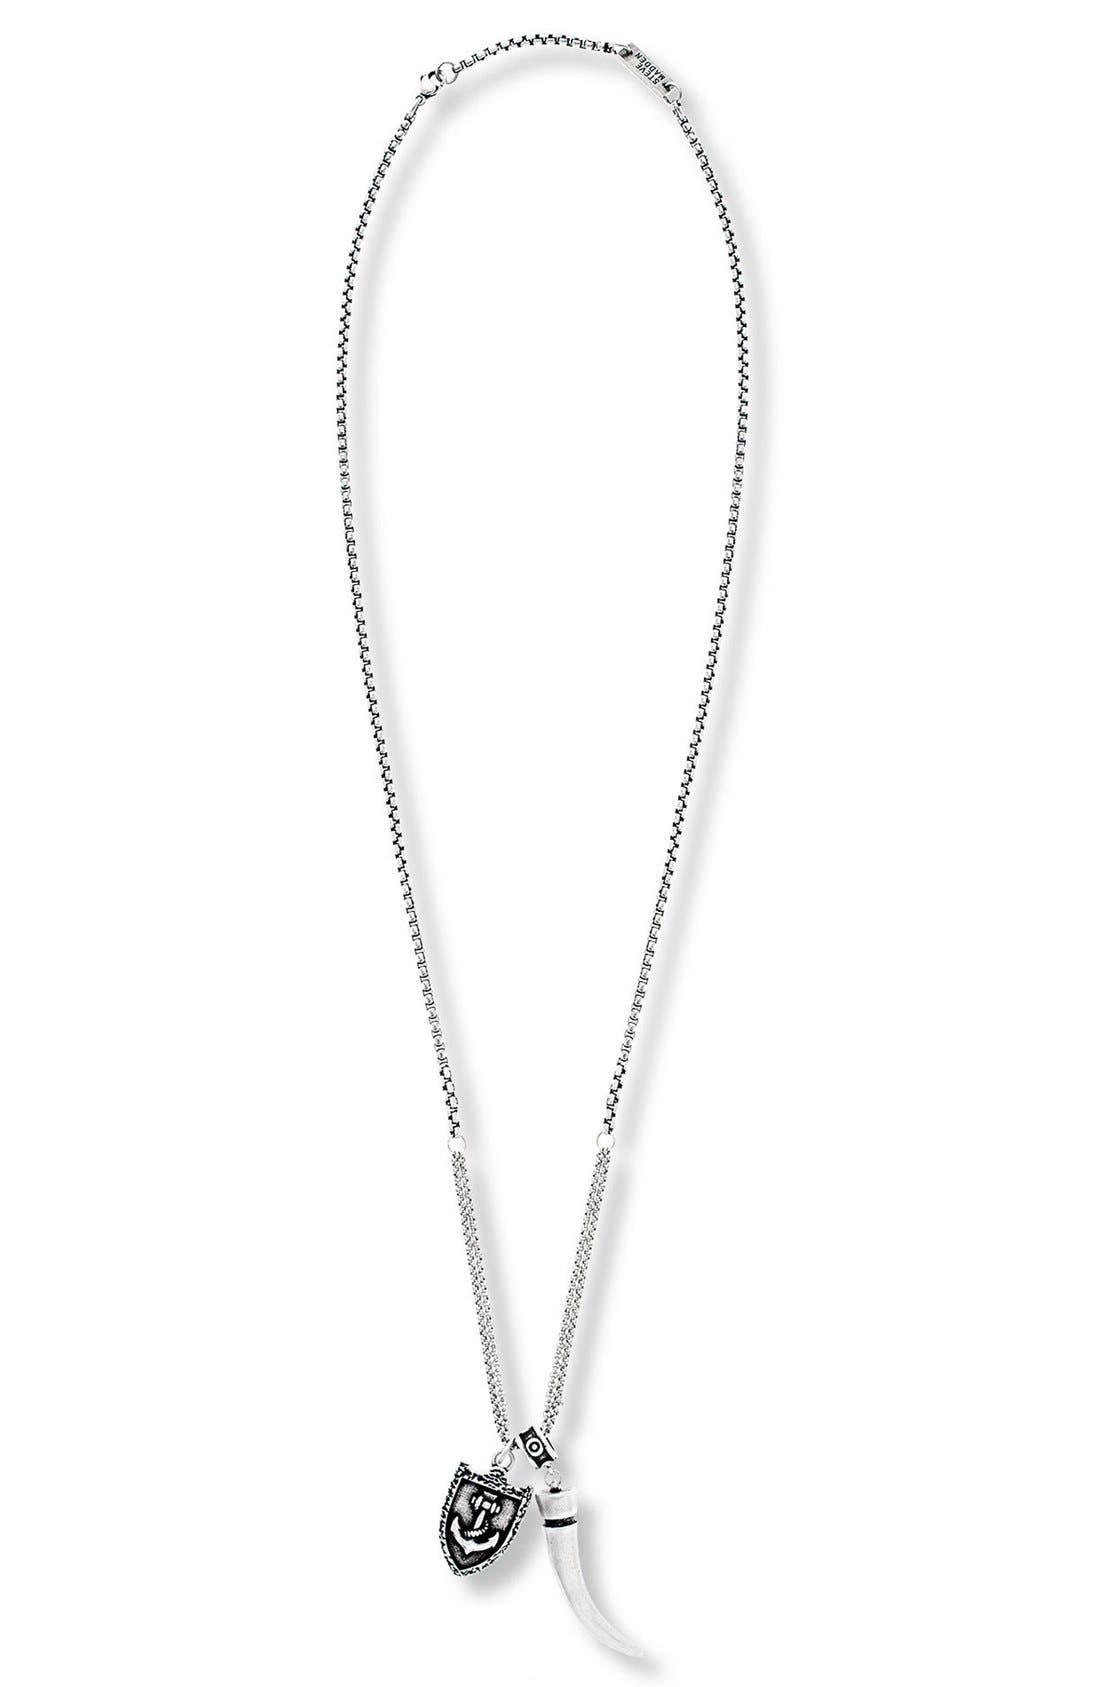 Main Image - Steve Madden Horn & Armor Pendant Necklace